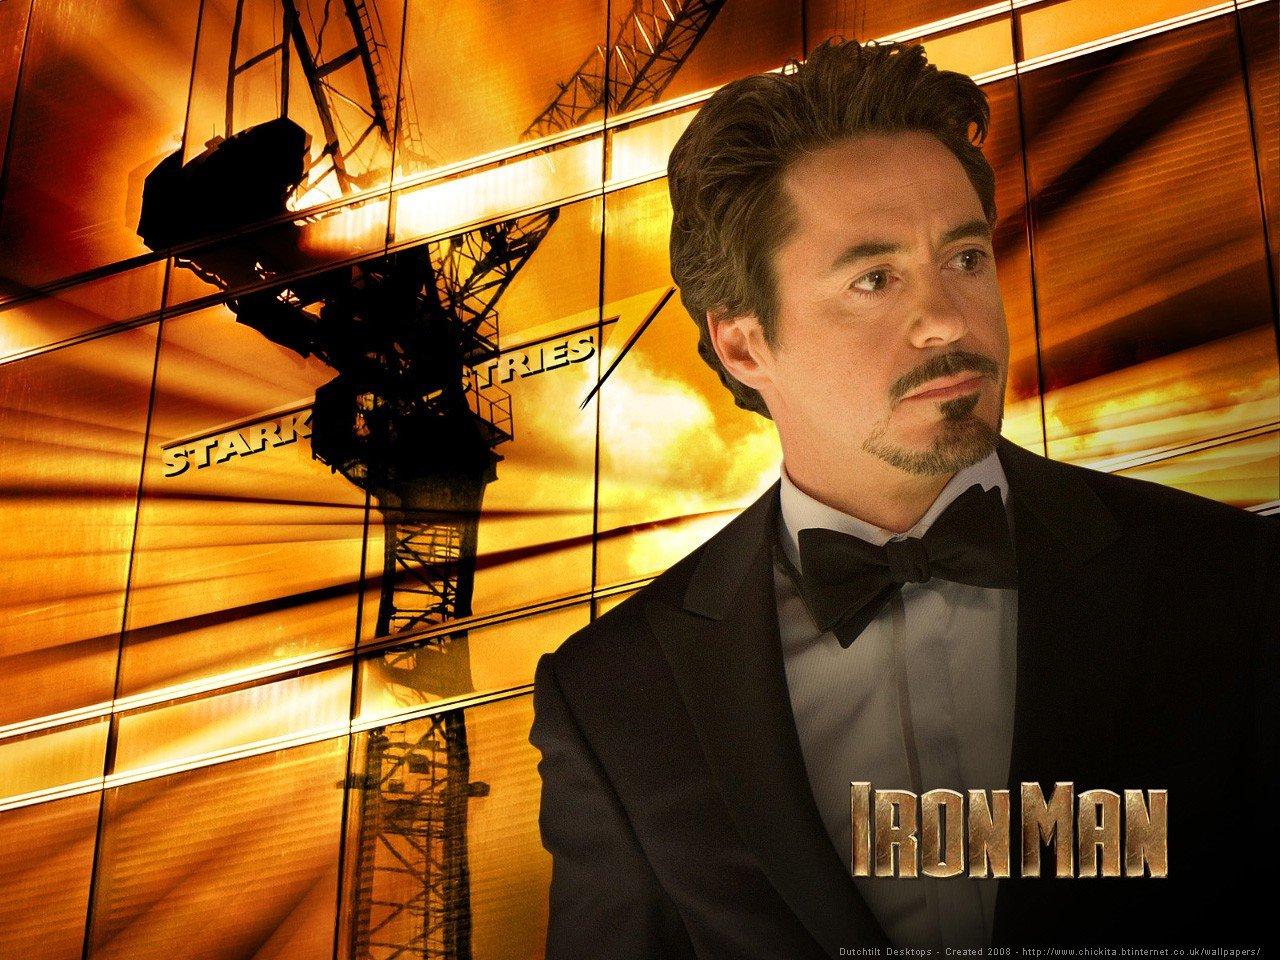 http://3.bp.blogspot.com/-3KHT7_x0K6g/T3q4Ce4xEtI/AAAAAAAABw4/X4ooBGE8bjc/s1600/Robert-Downey-Jr-04.jpg